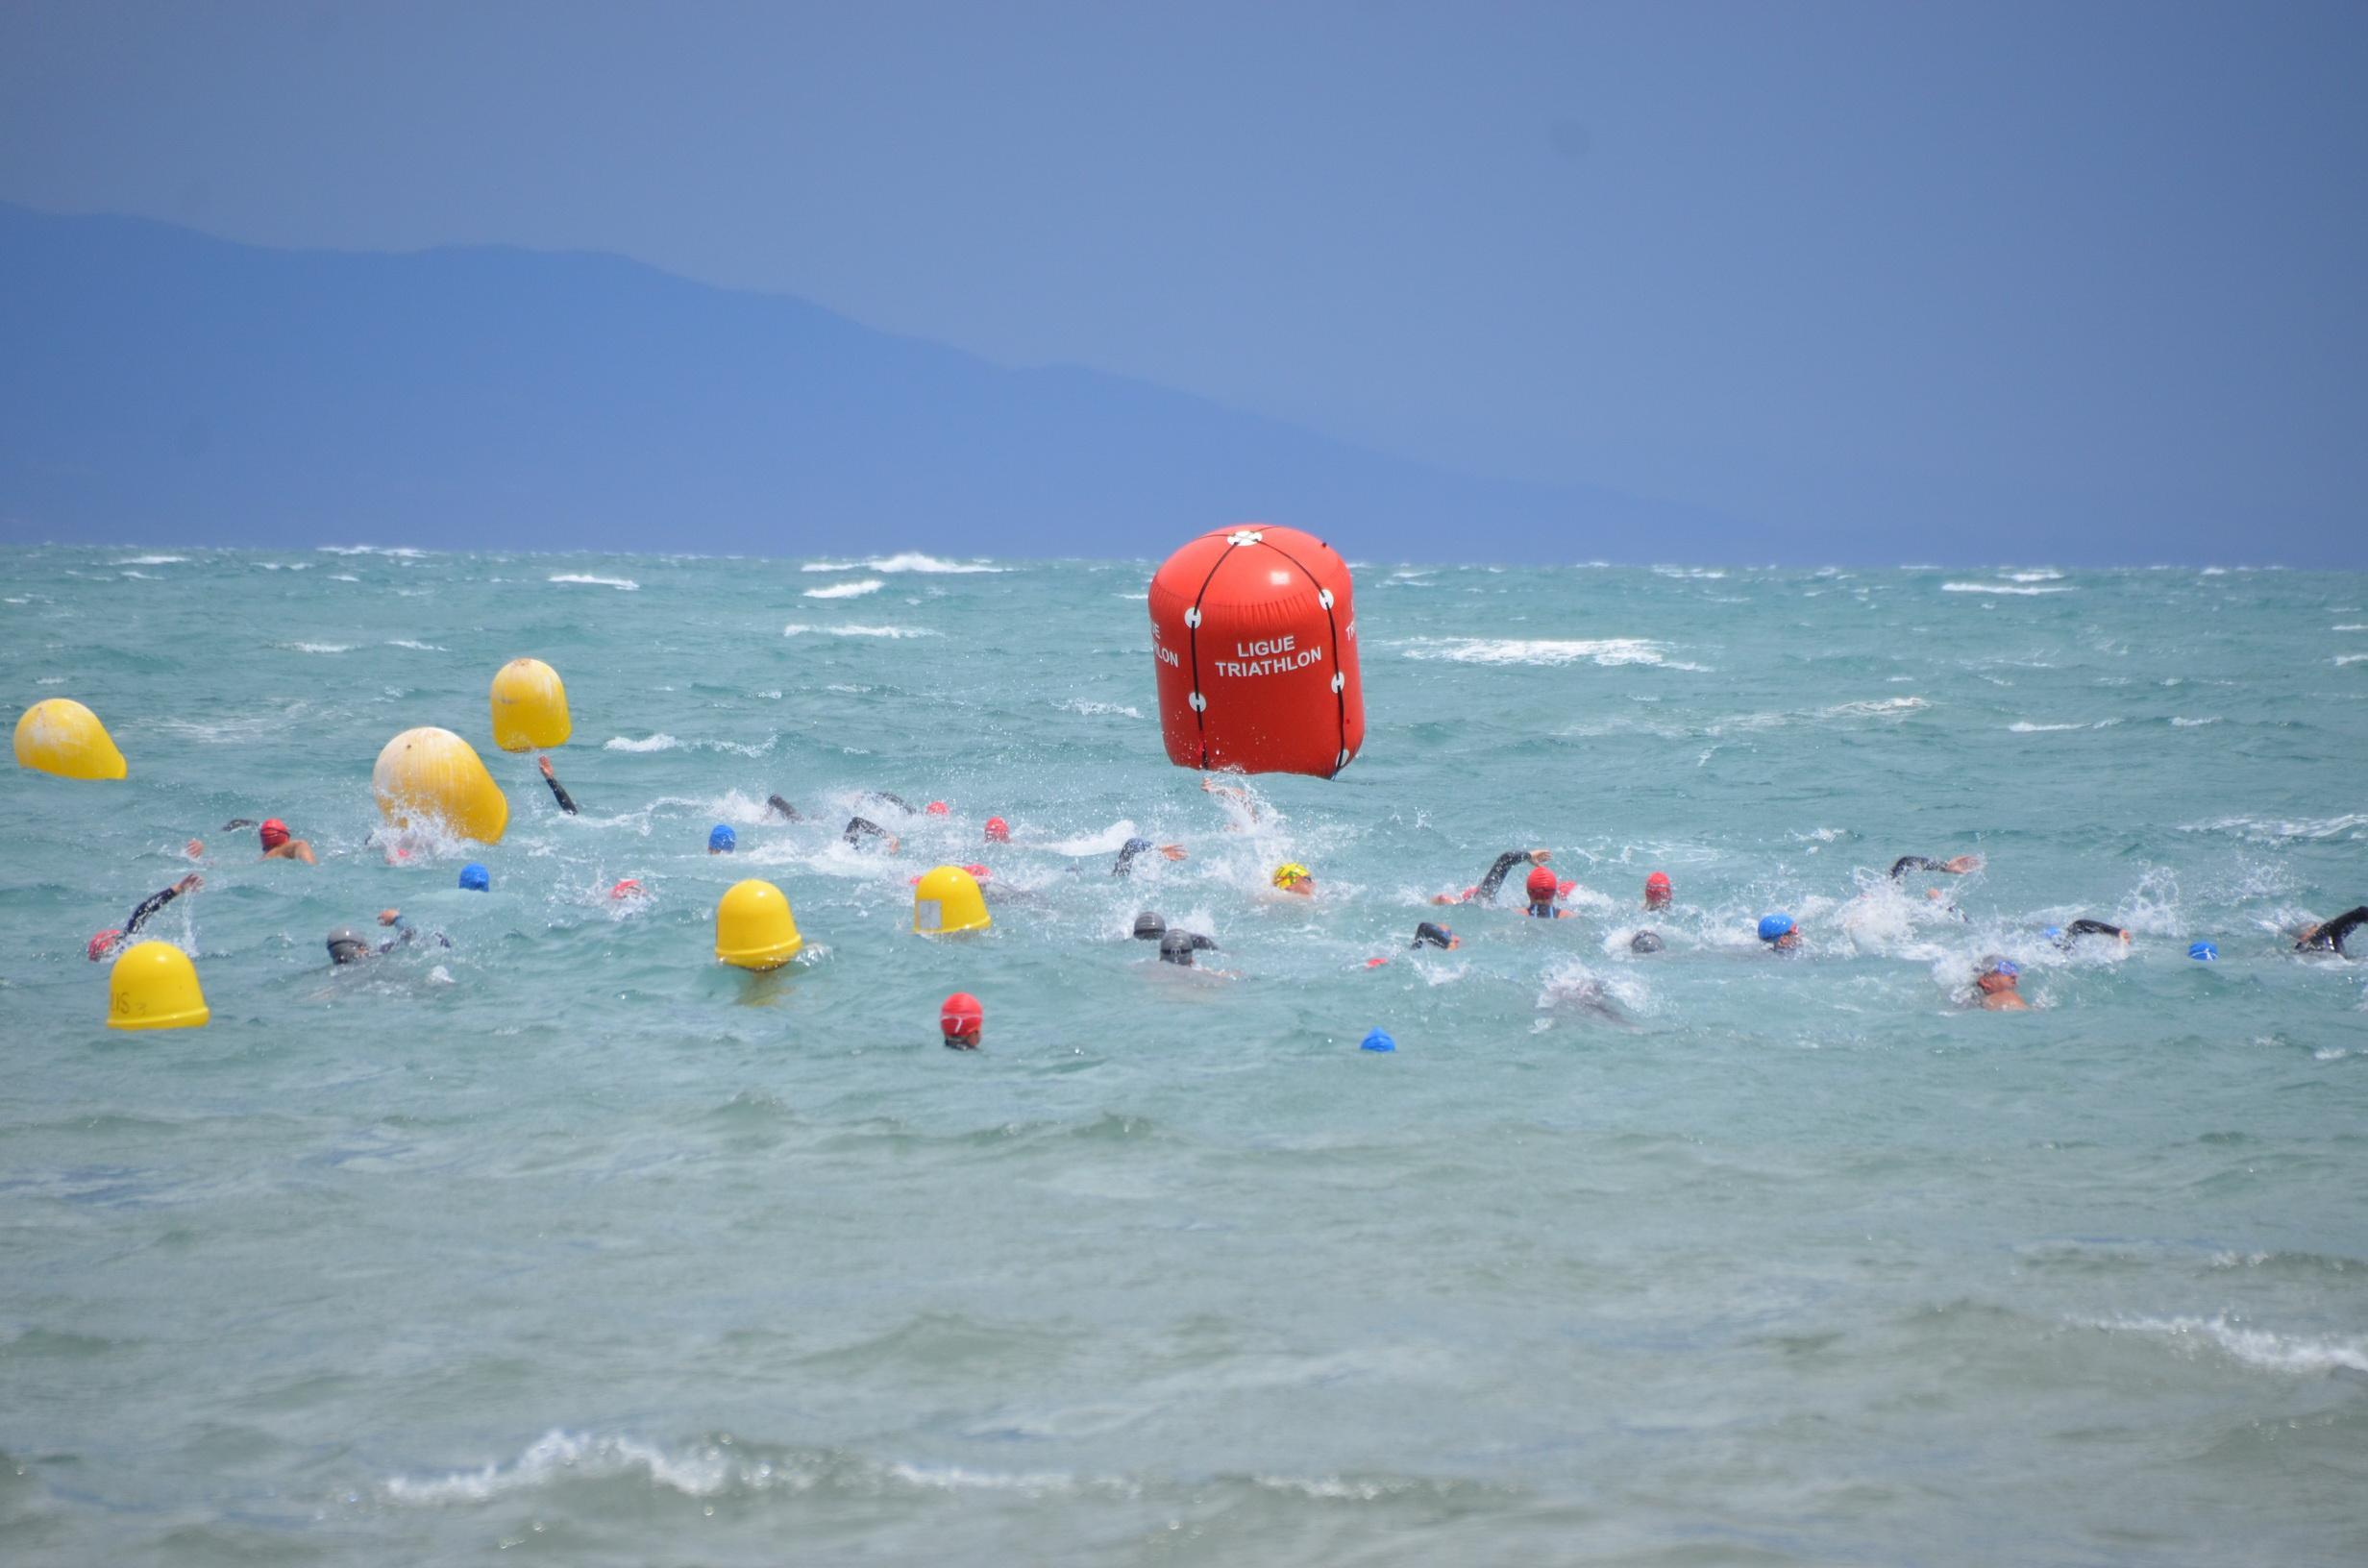 Aquaroc d'Antibes: aquathlon qualificatif pour les championnats de France jeunes